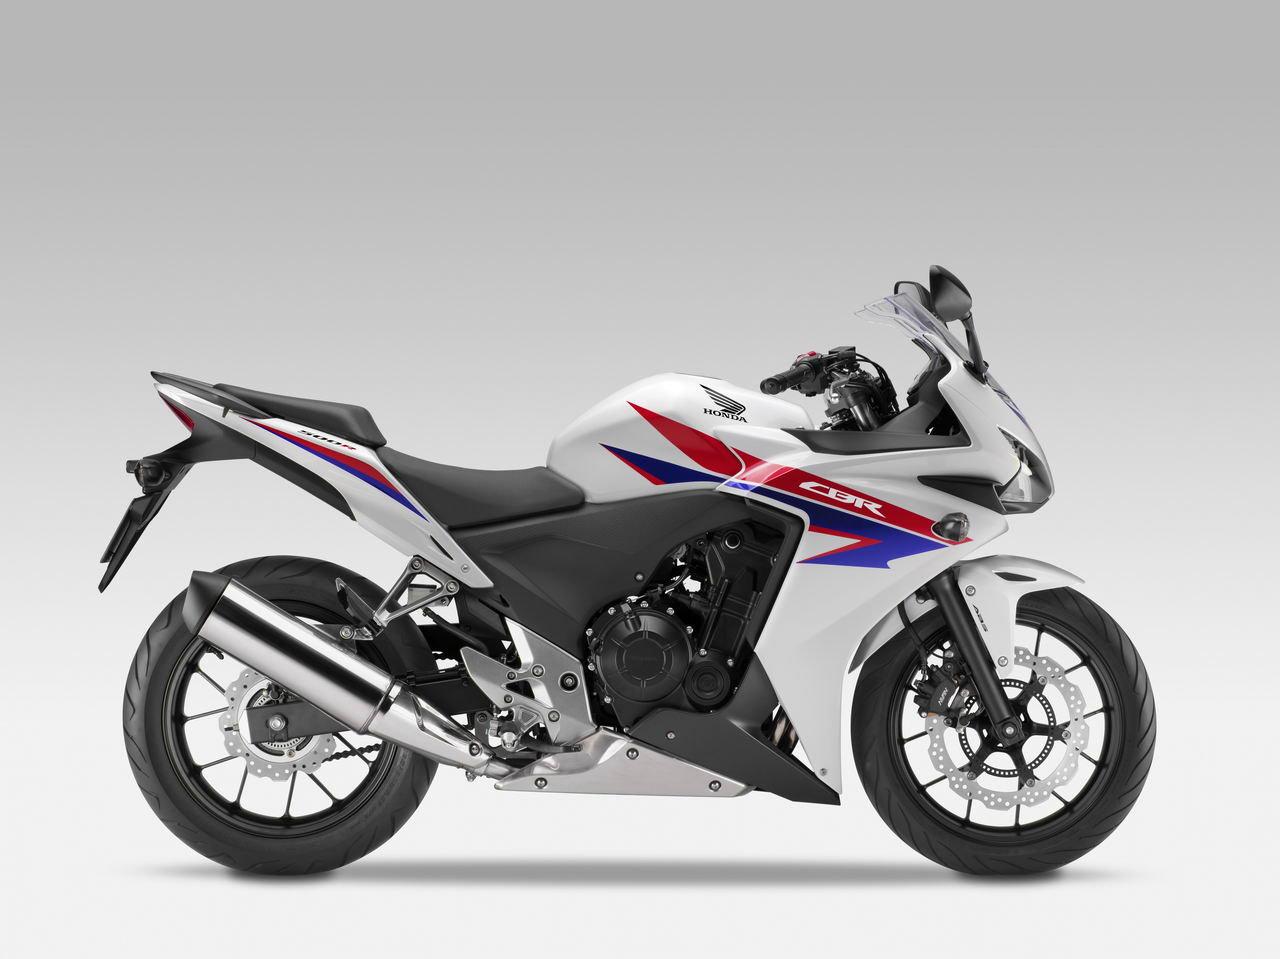 Listino Honda CB 500F Naked Media - image 14647_honda-cb500rabs on http://moto.motori.net